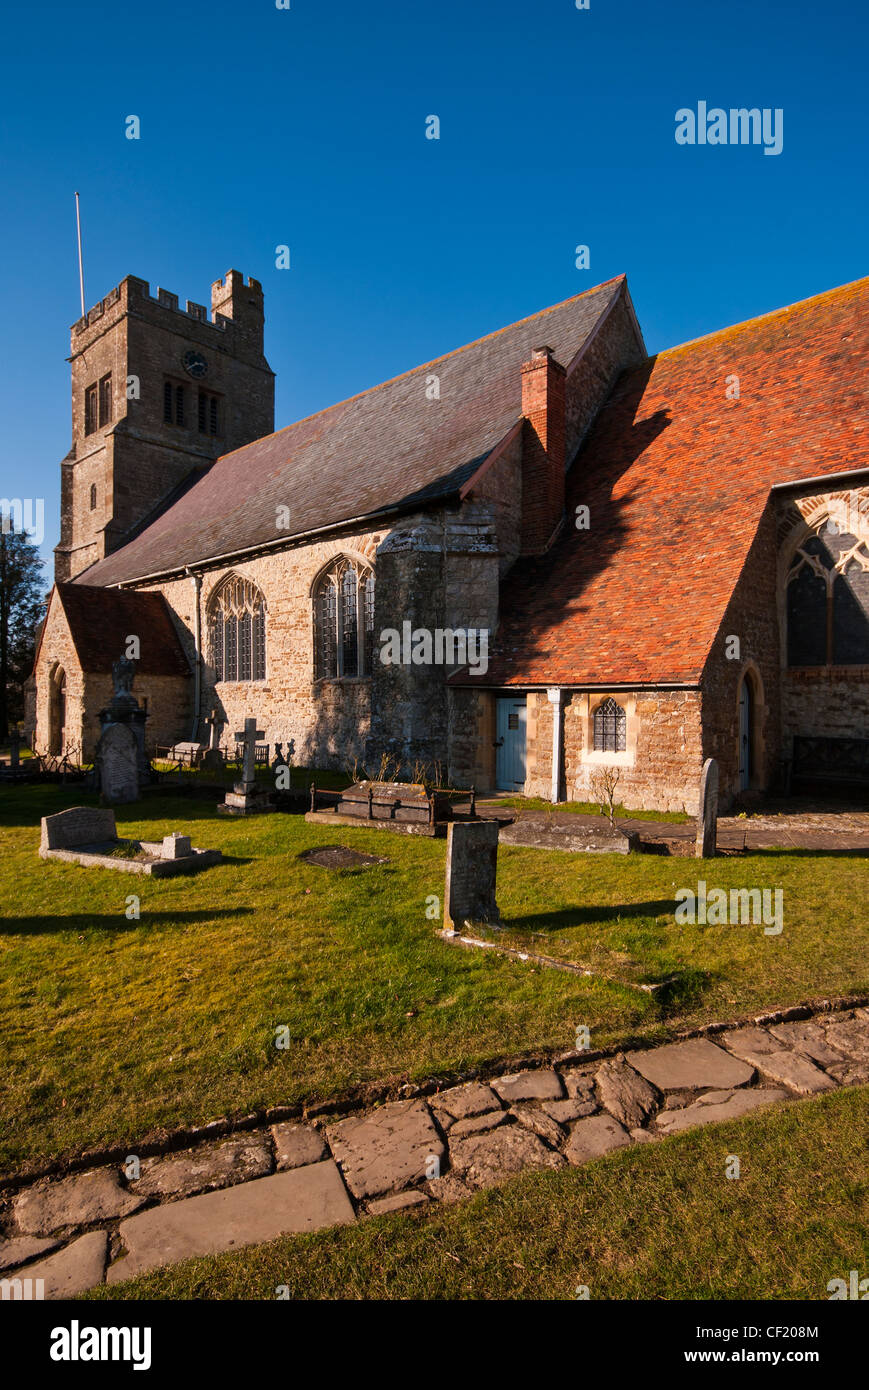 St Saint Michael The Archangel Parish Church Smarden Kent UK Village Churches - Stock Image